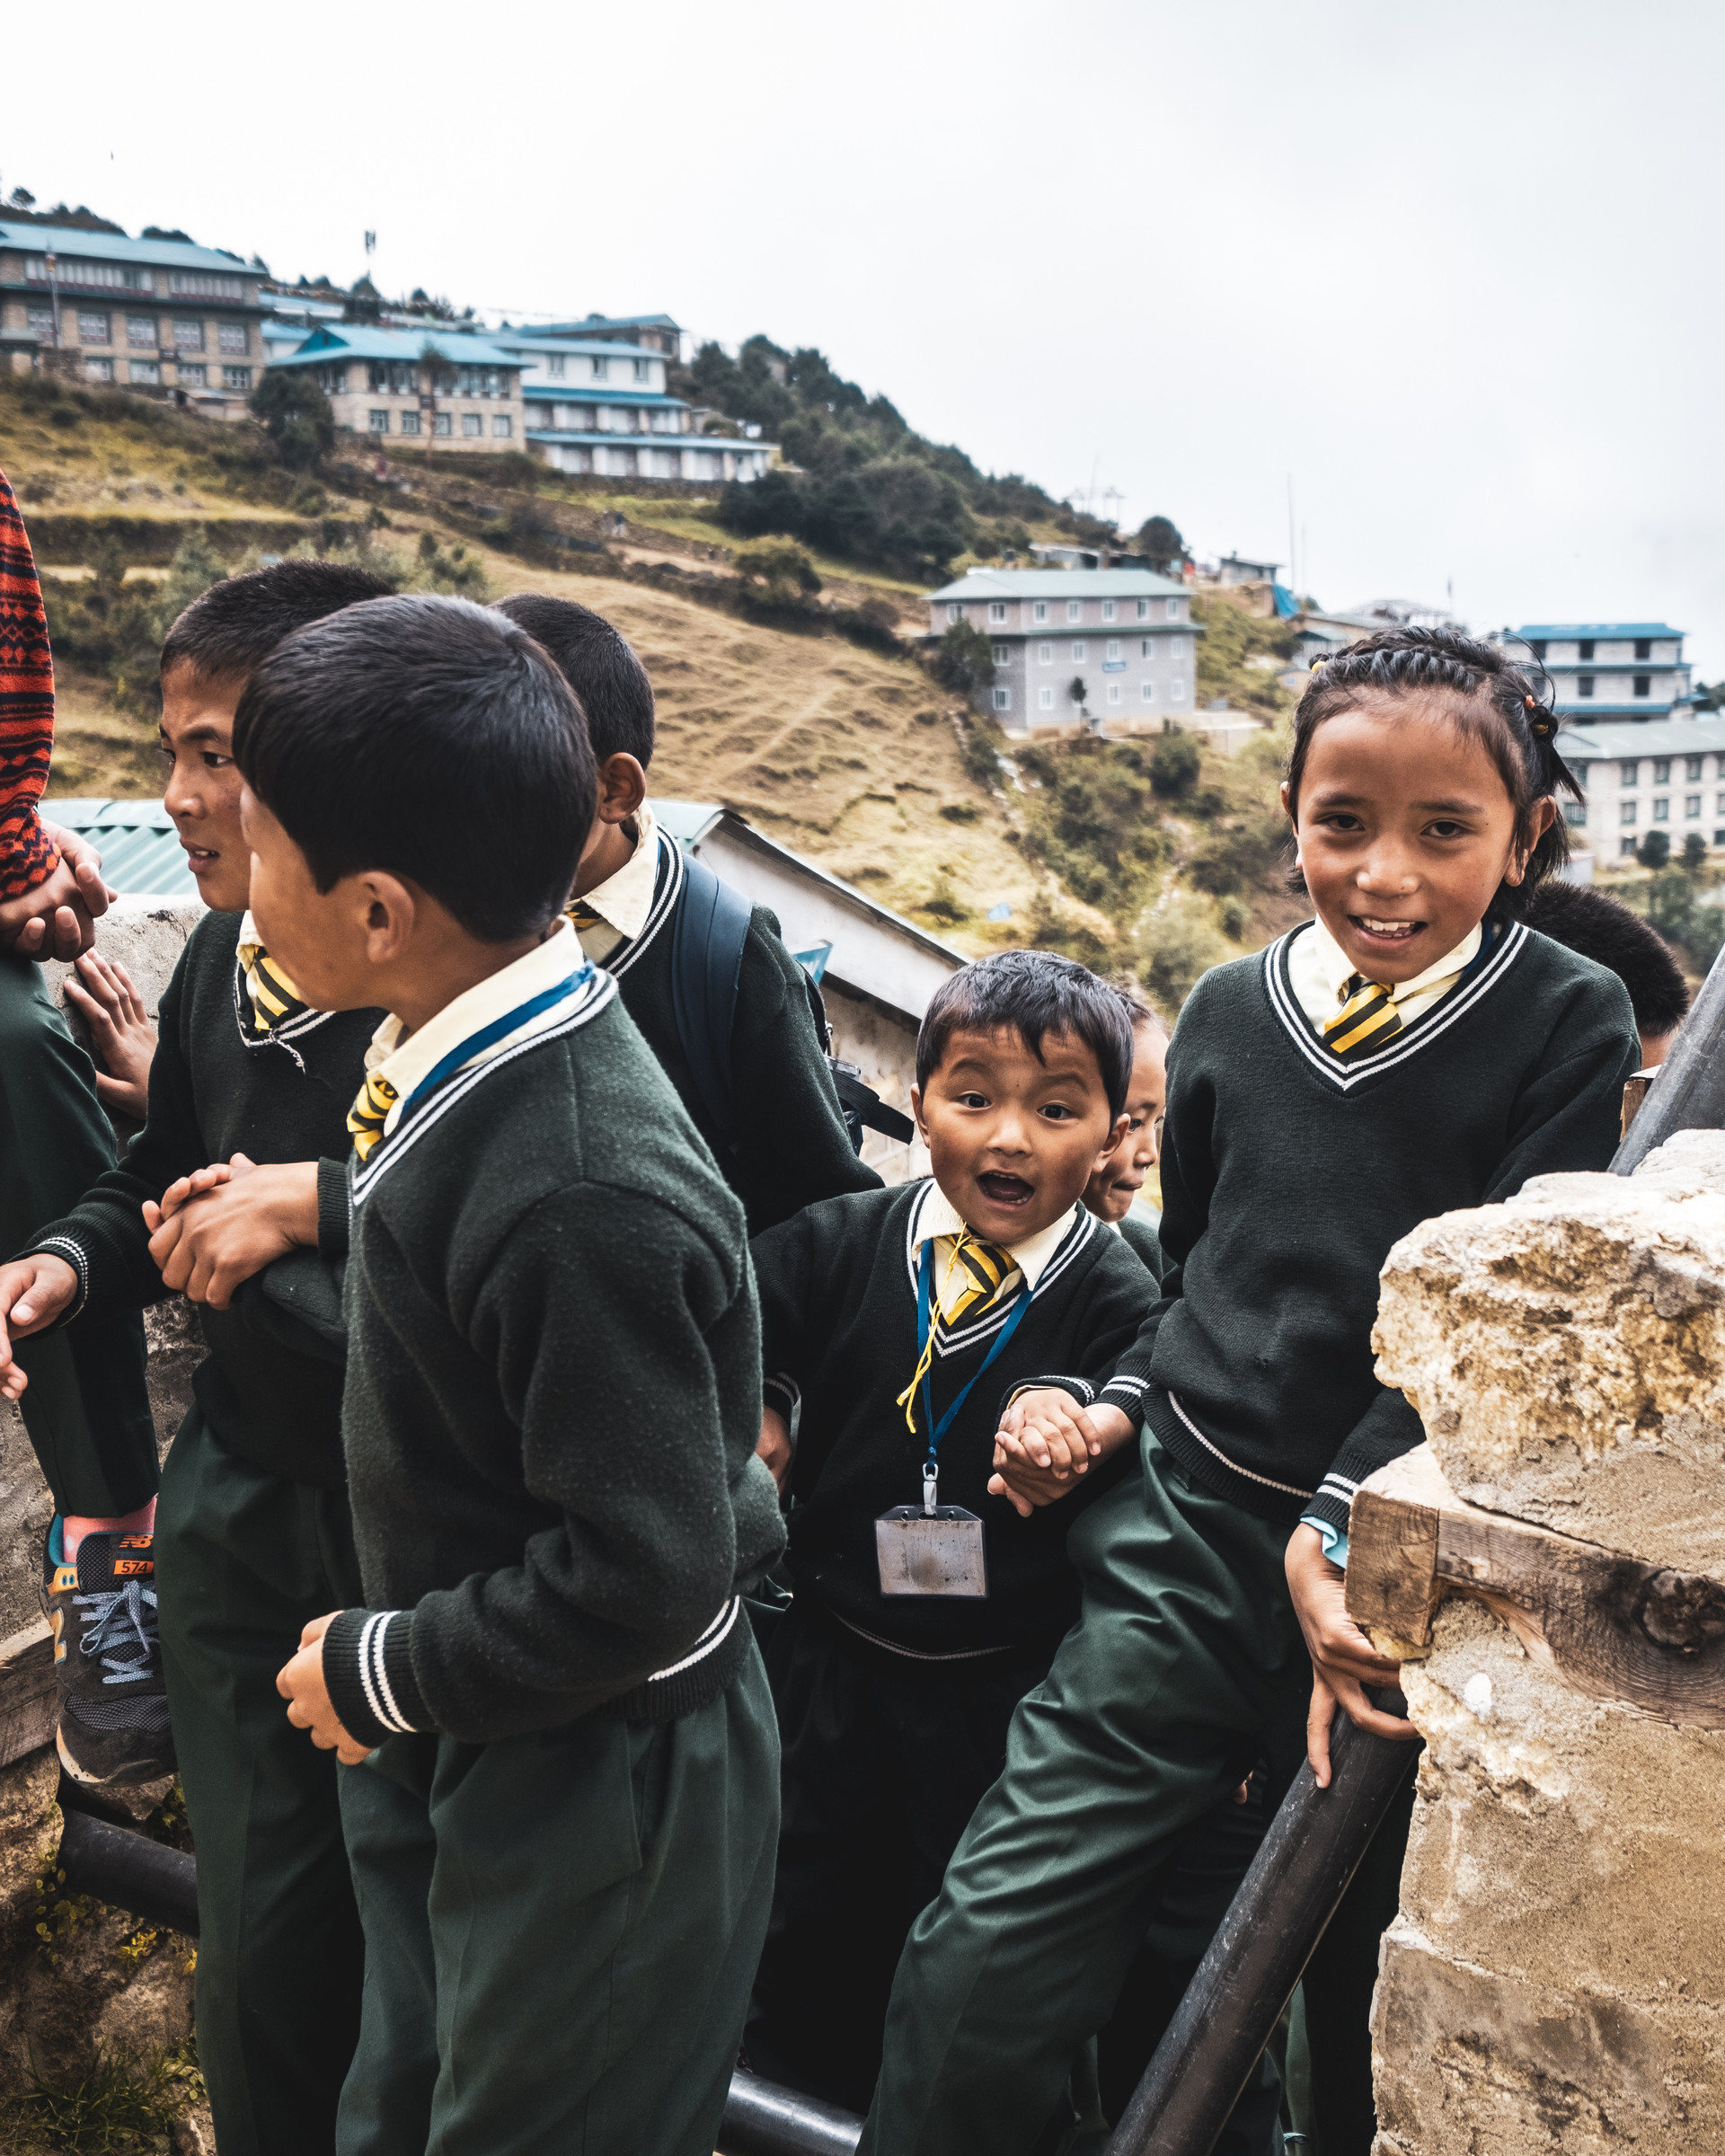 nepal_port-119827.jpg